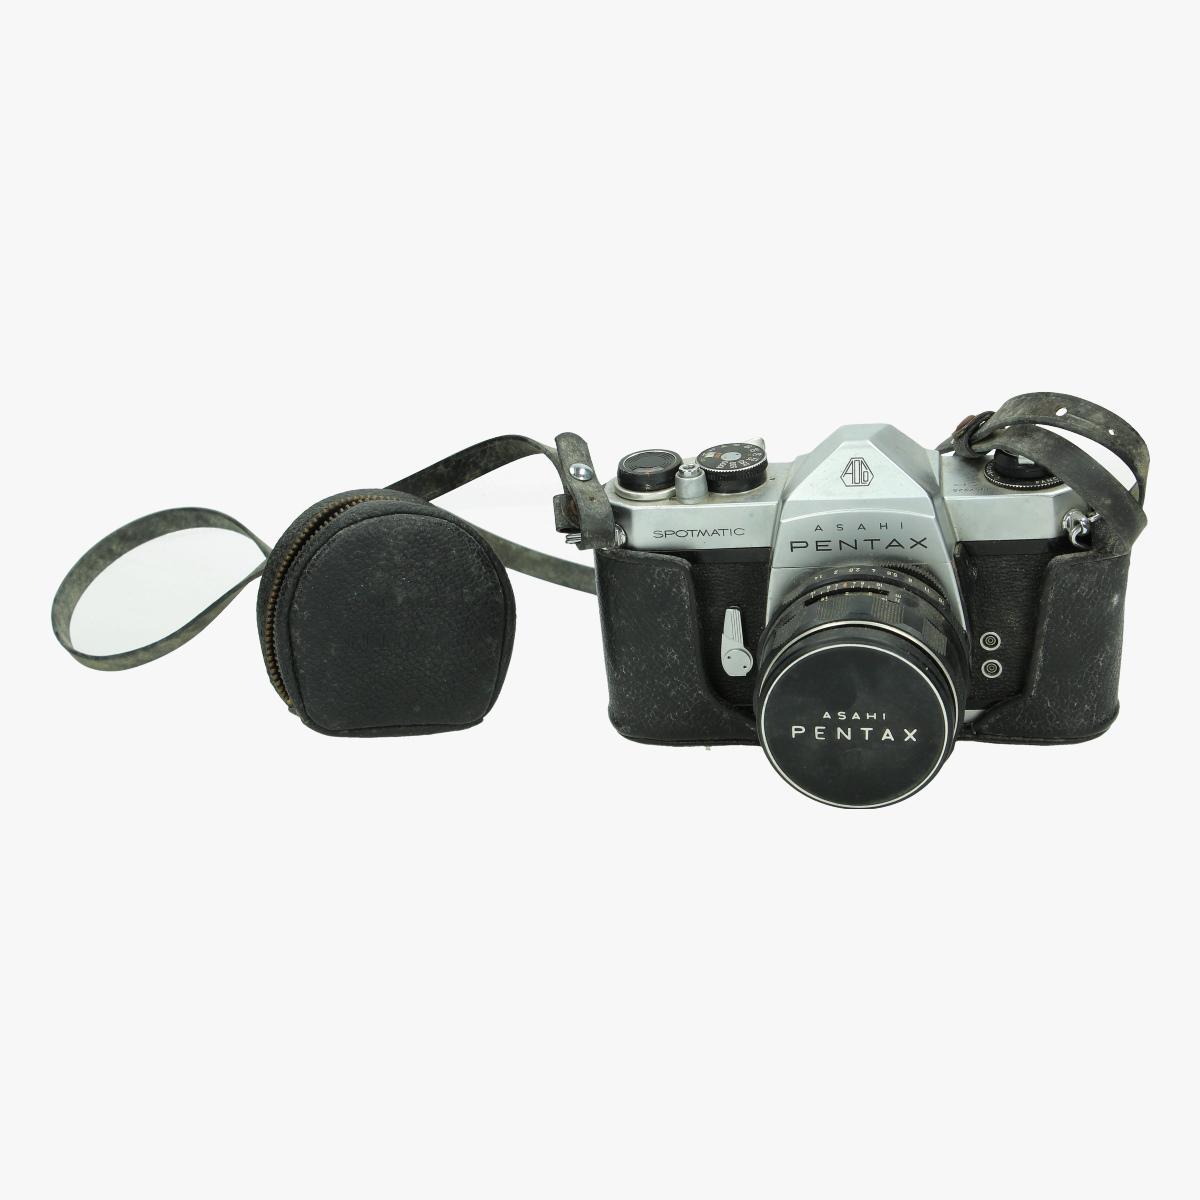 Afbeeldingen van fotocamera pentax asahi sportmatic japan 1062925 SP